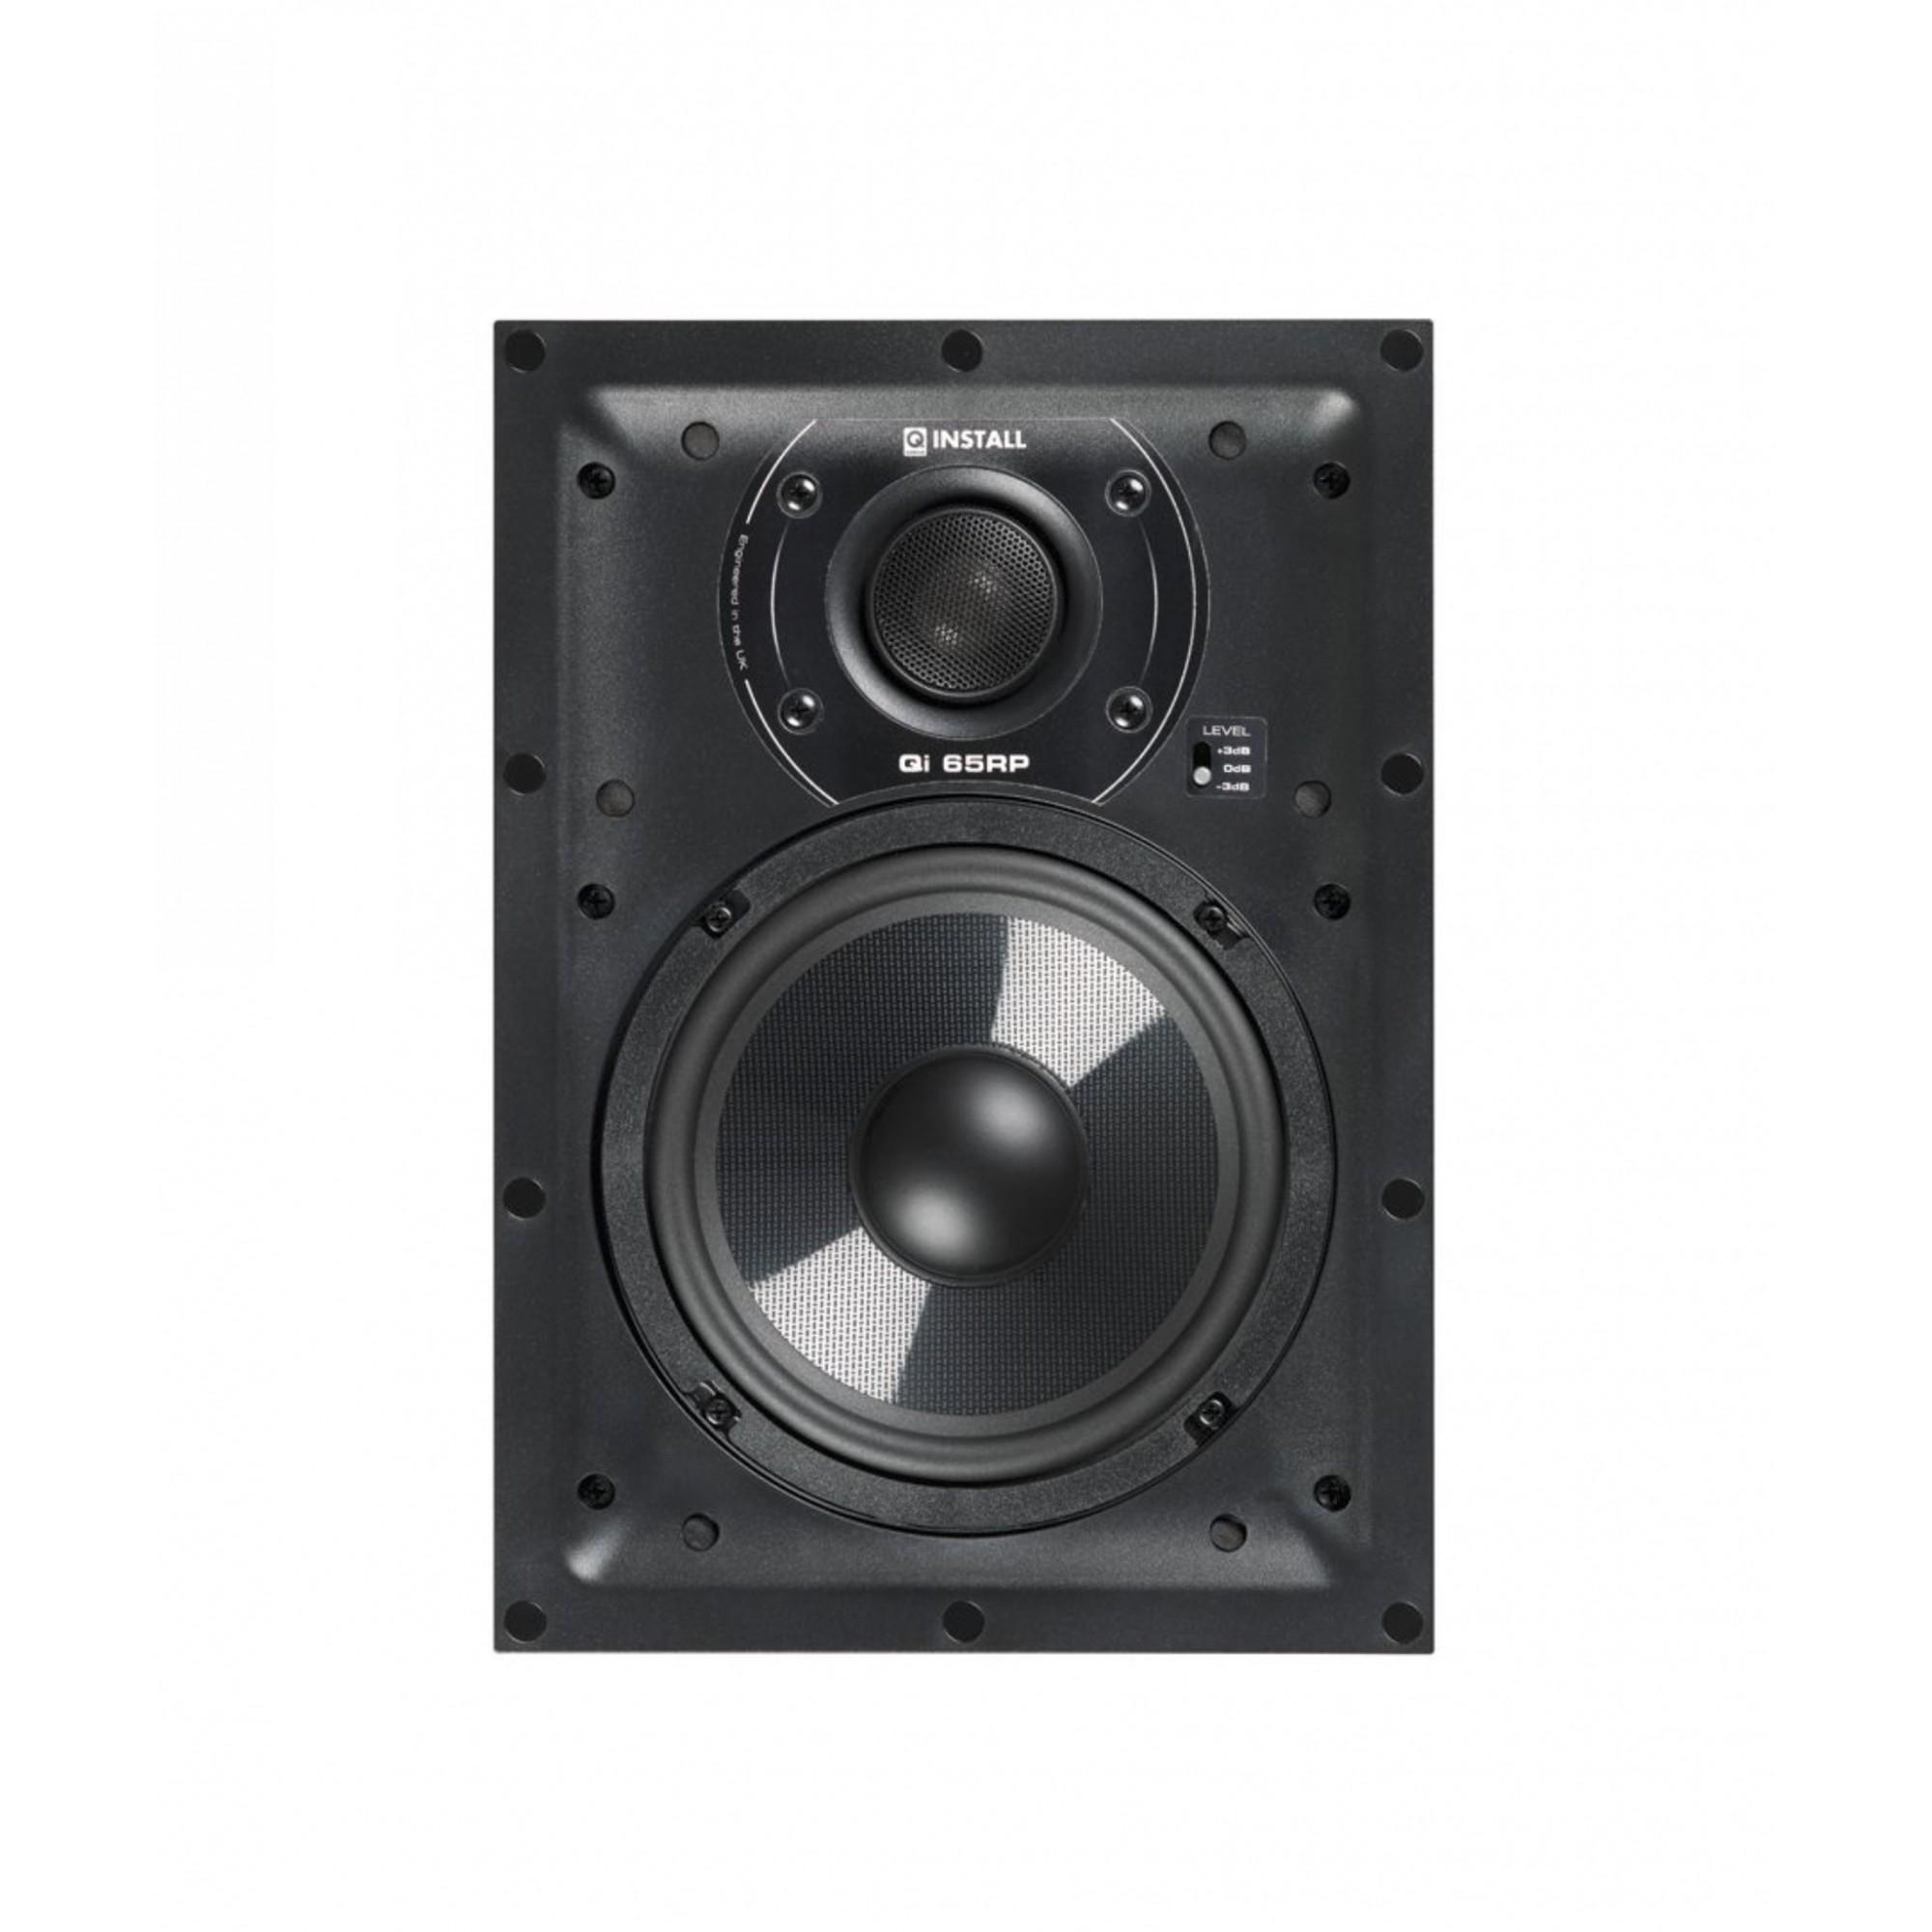 Caixa Q Acoustics Qi65rp Install In-wall Unidade